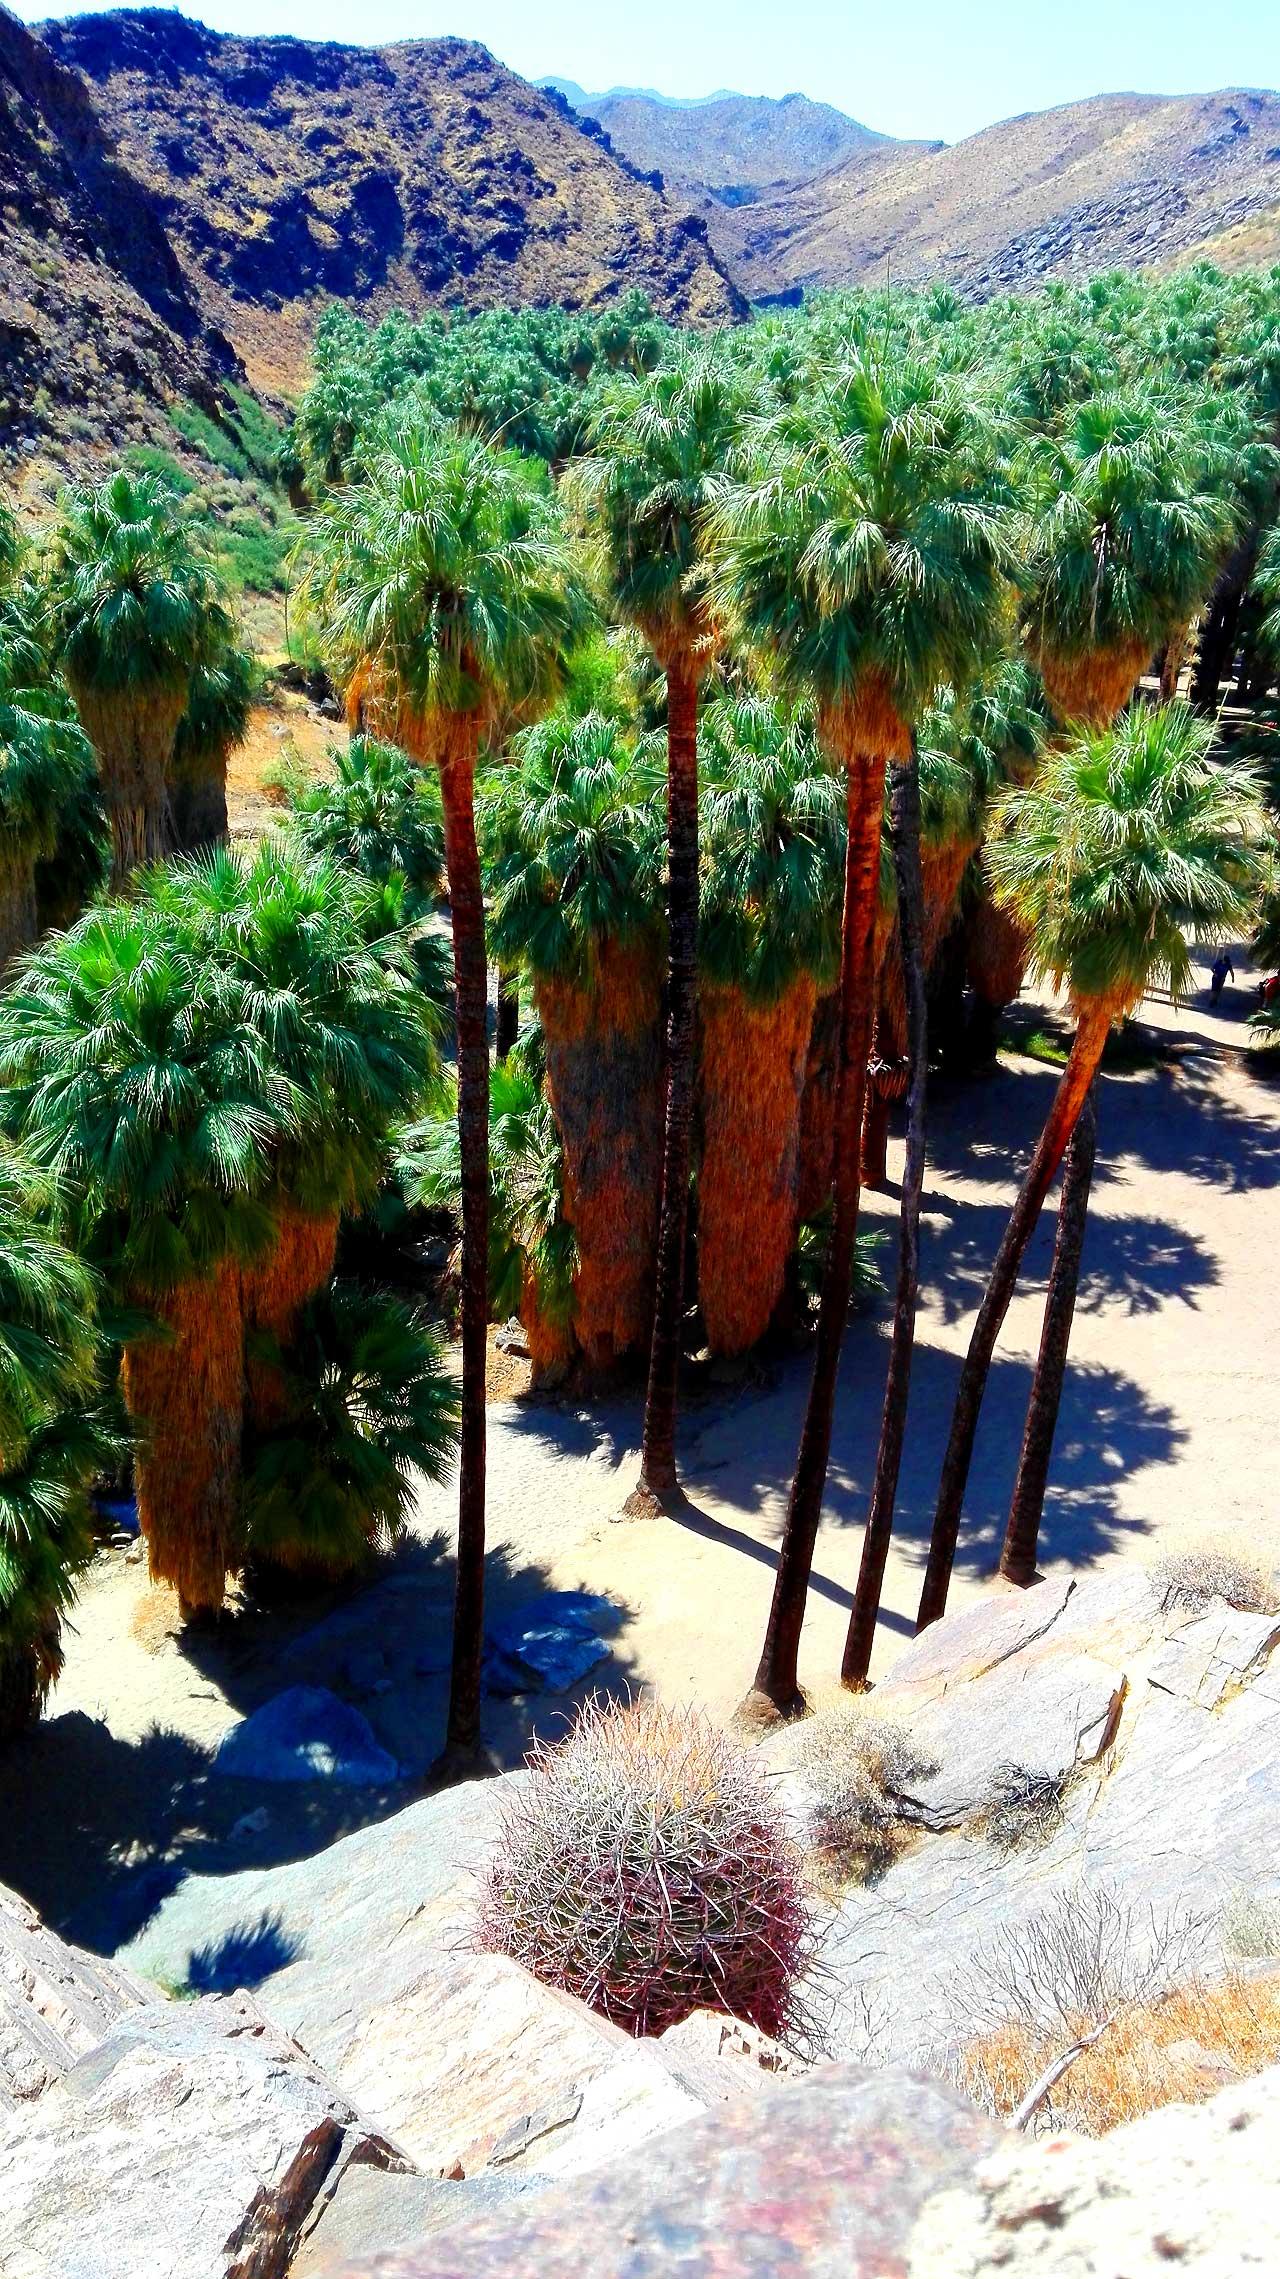 palmentäler